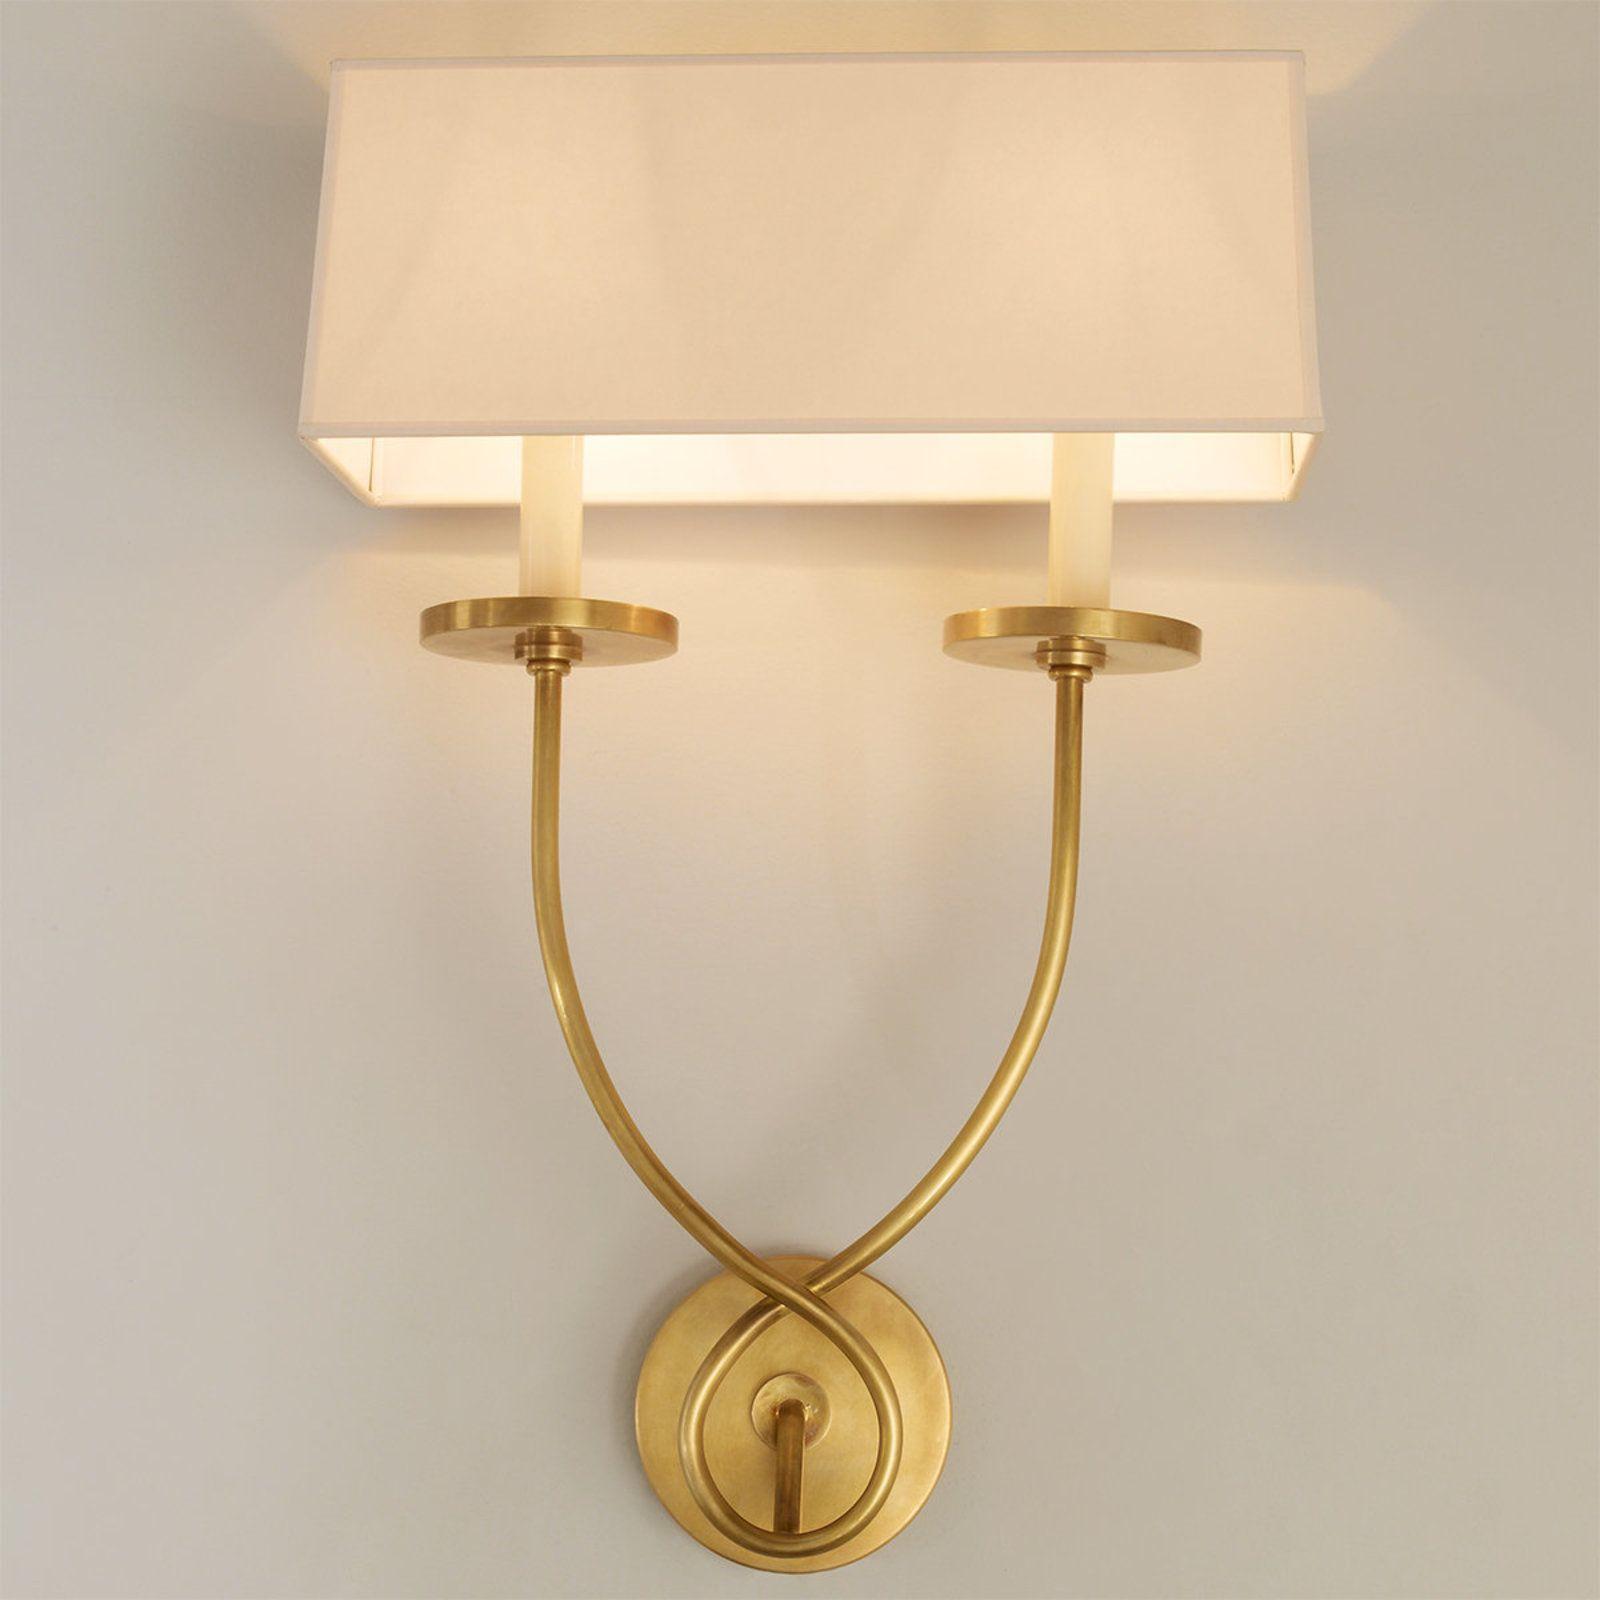 French Twist 2 Light Sconce Sconce Lighting Sconce Lighting Hallway Sconces